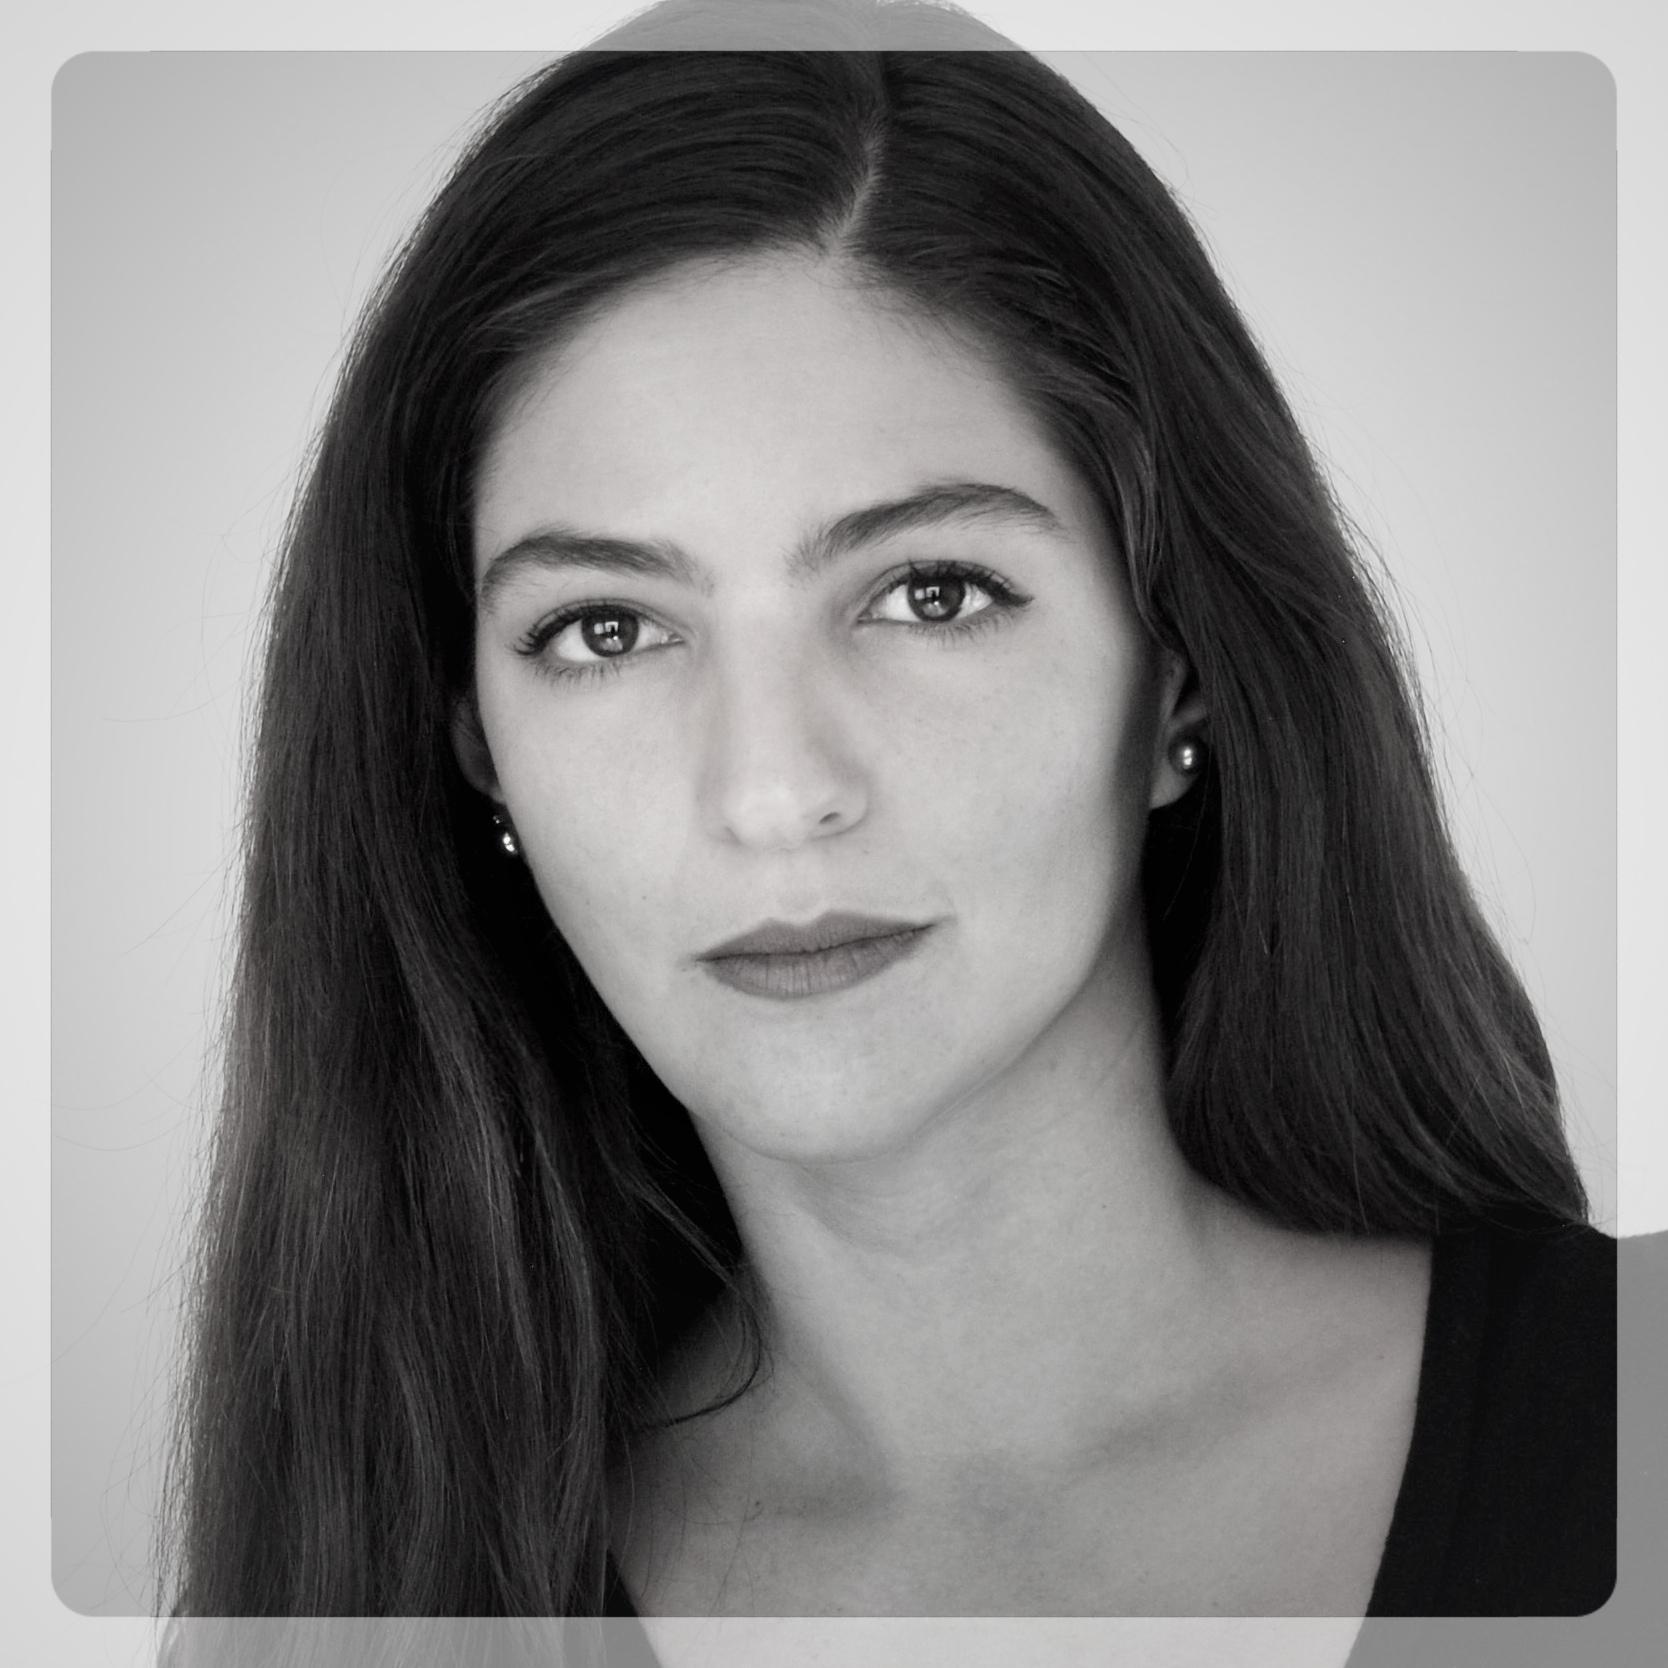 Perla Villarello